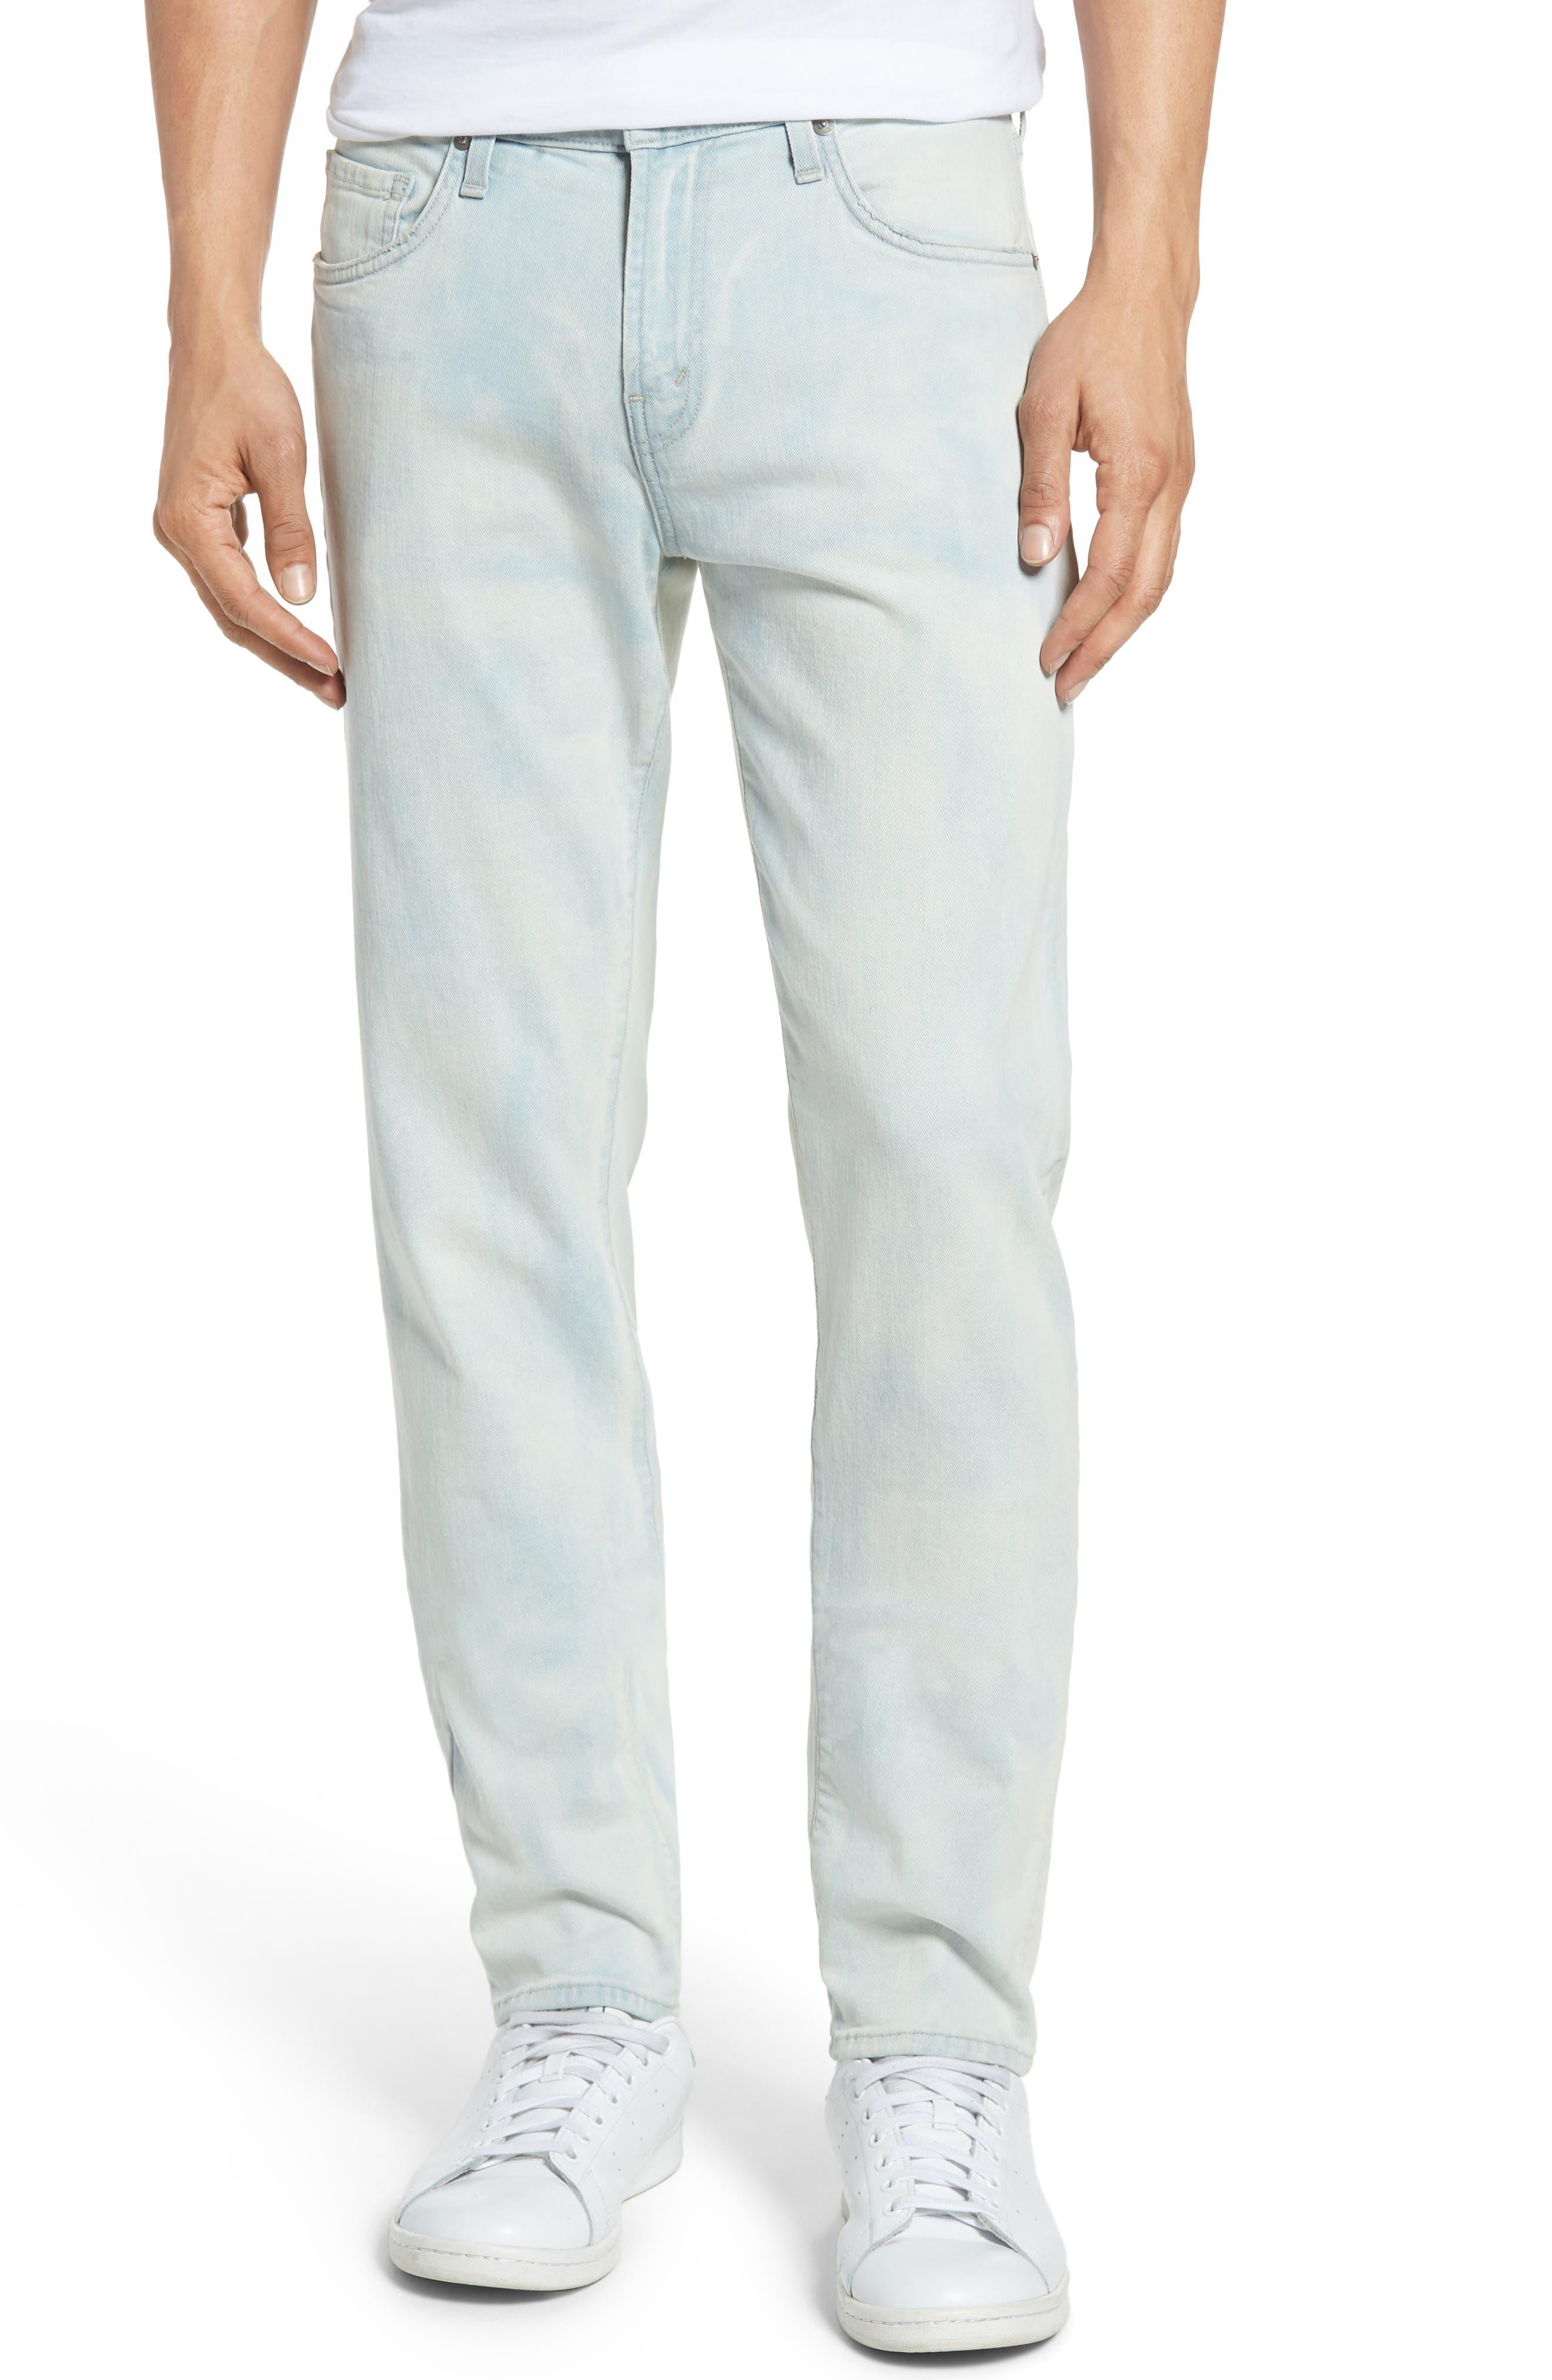 Tyler Slim Fit Jeans,                         Main,                         color, 455